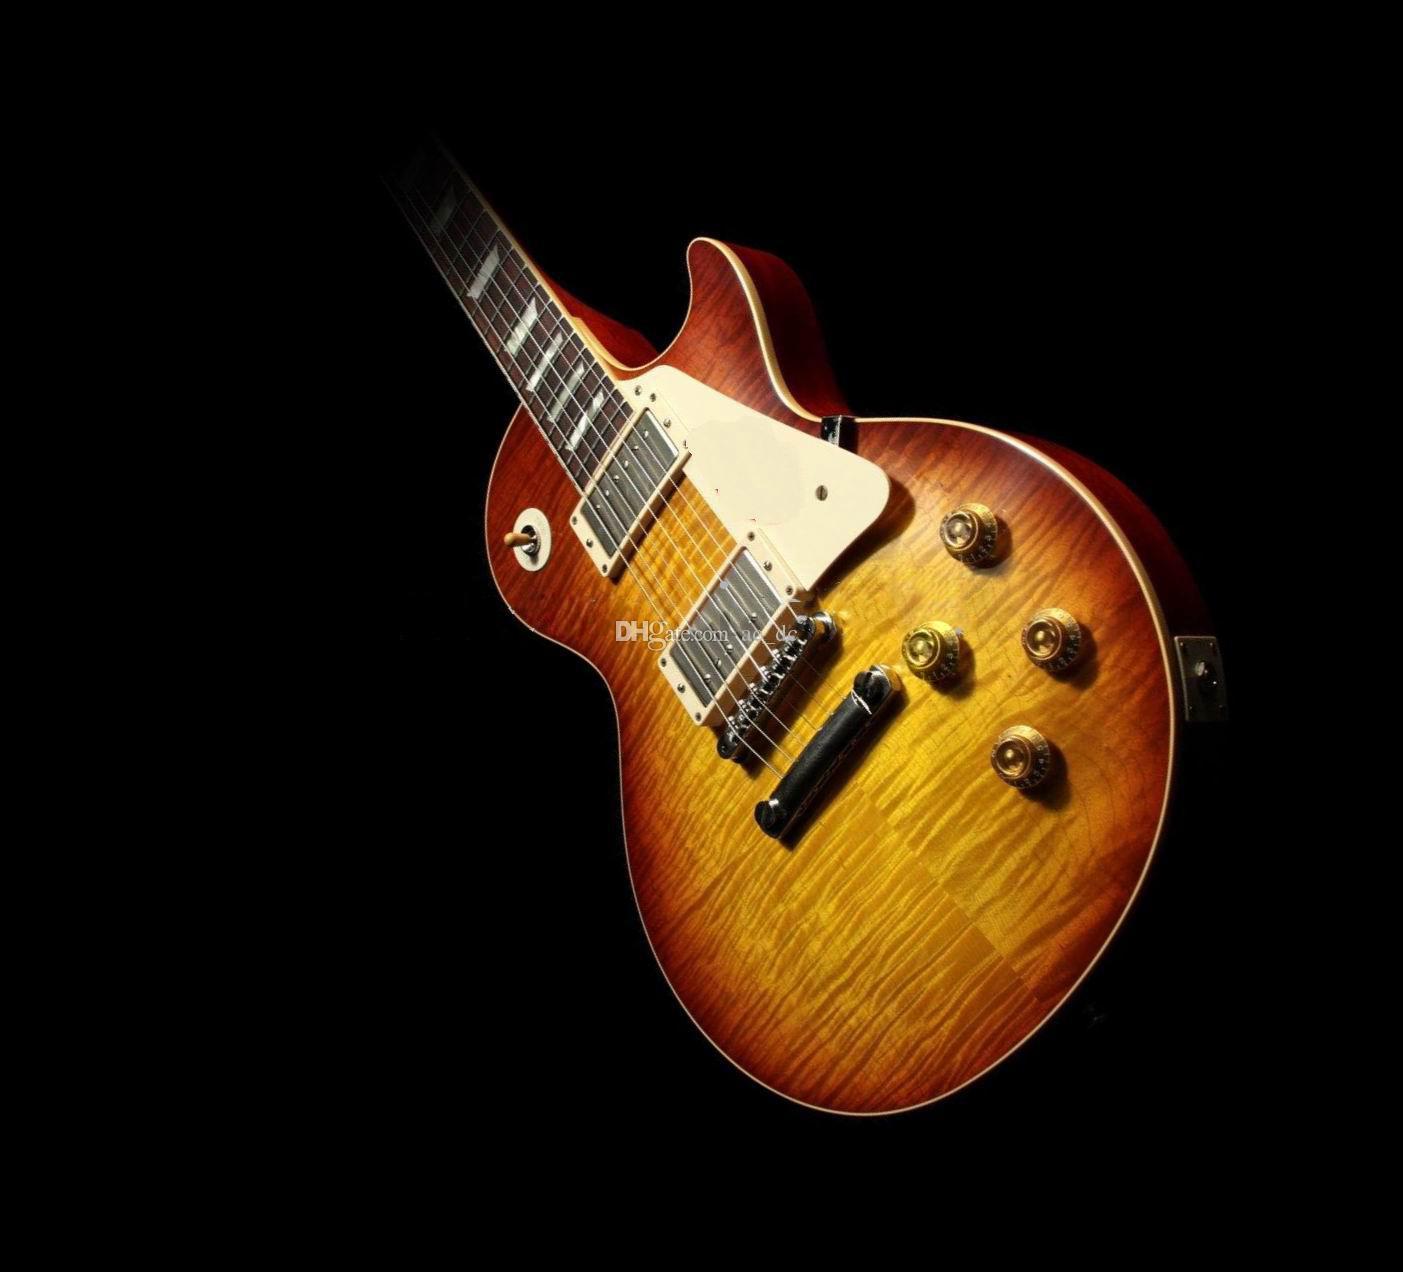 ¡En stock! 1959 R9 Vos Tobacco Sunburst Jimmy Página No. 1 Guitarra eléctrica Tiger Fame Maple Top, crema PickGuard, Crema Body Binding